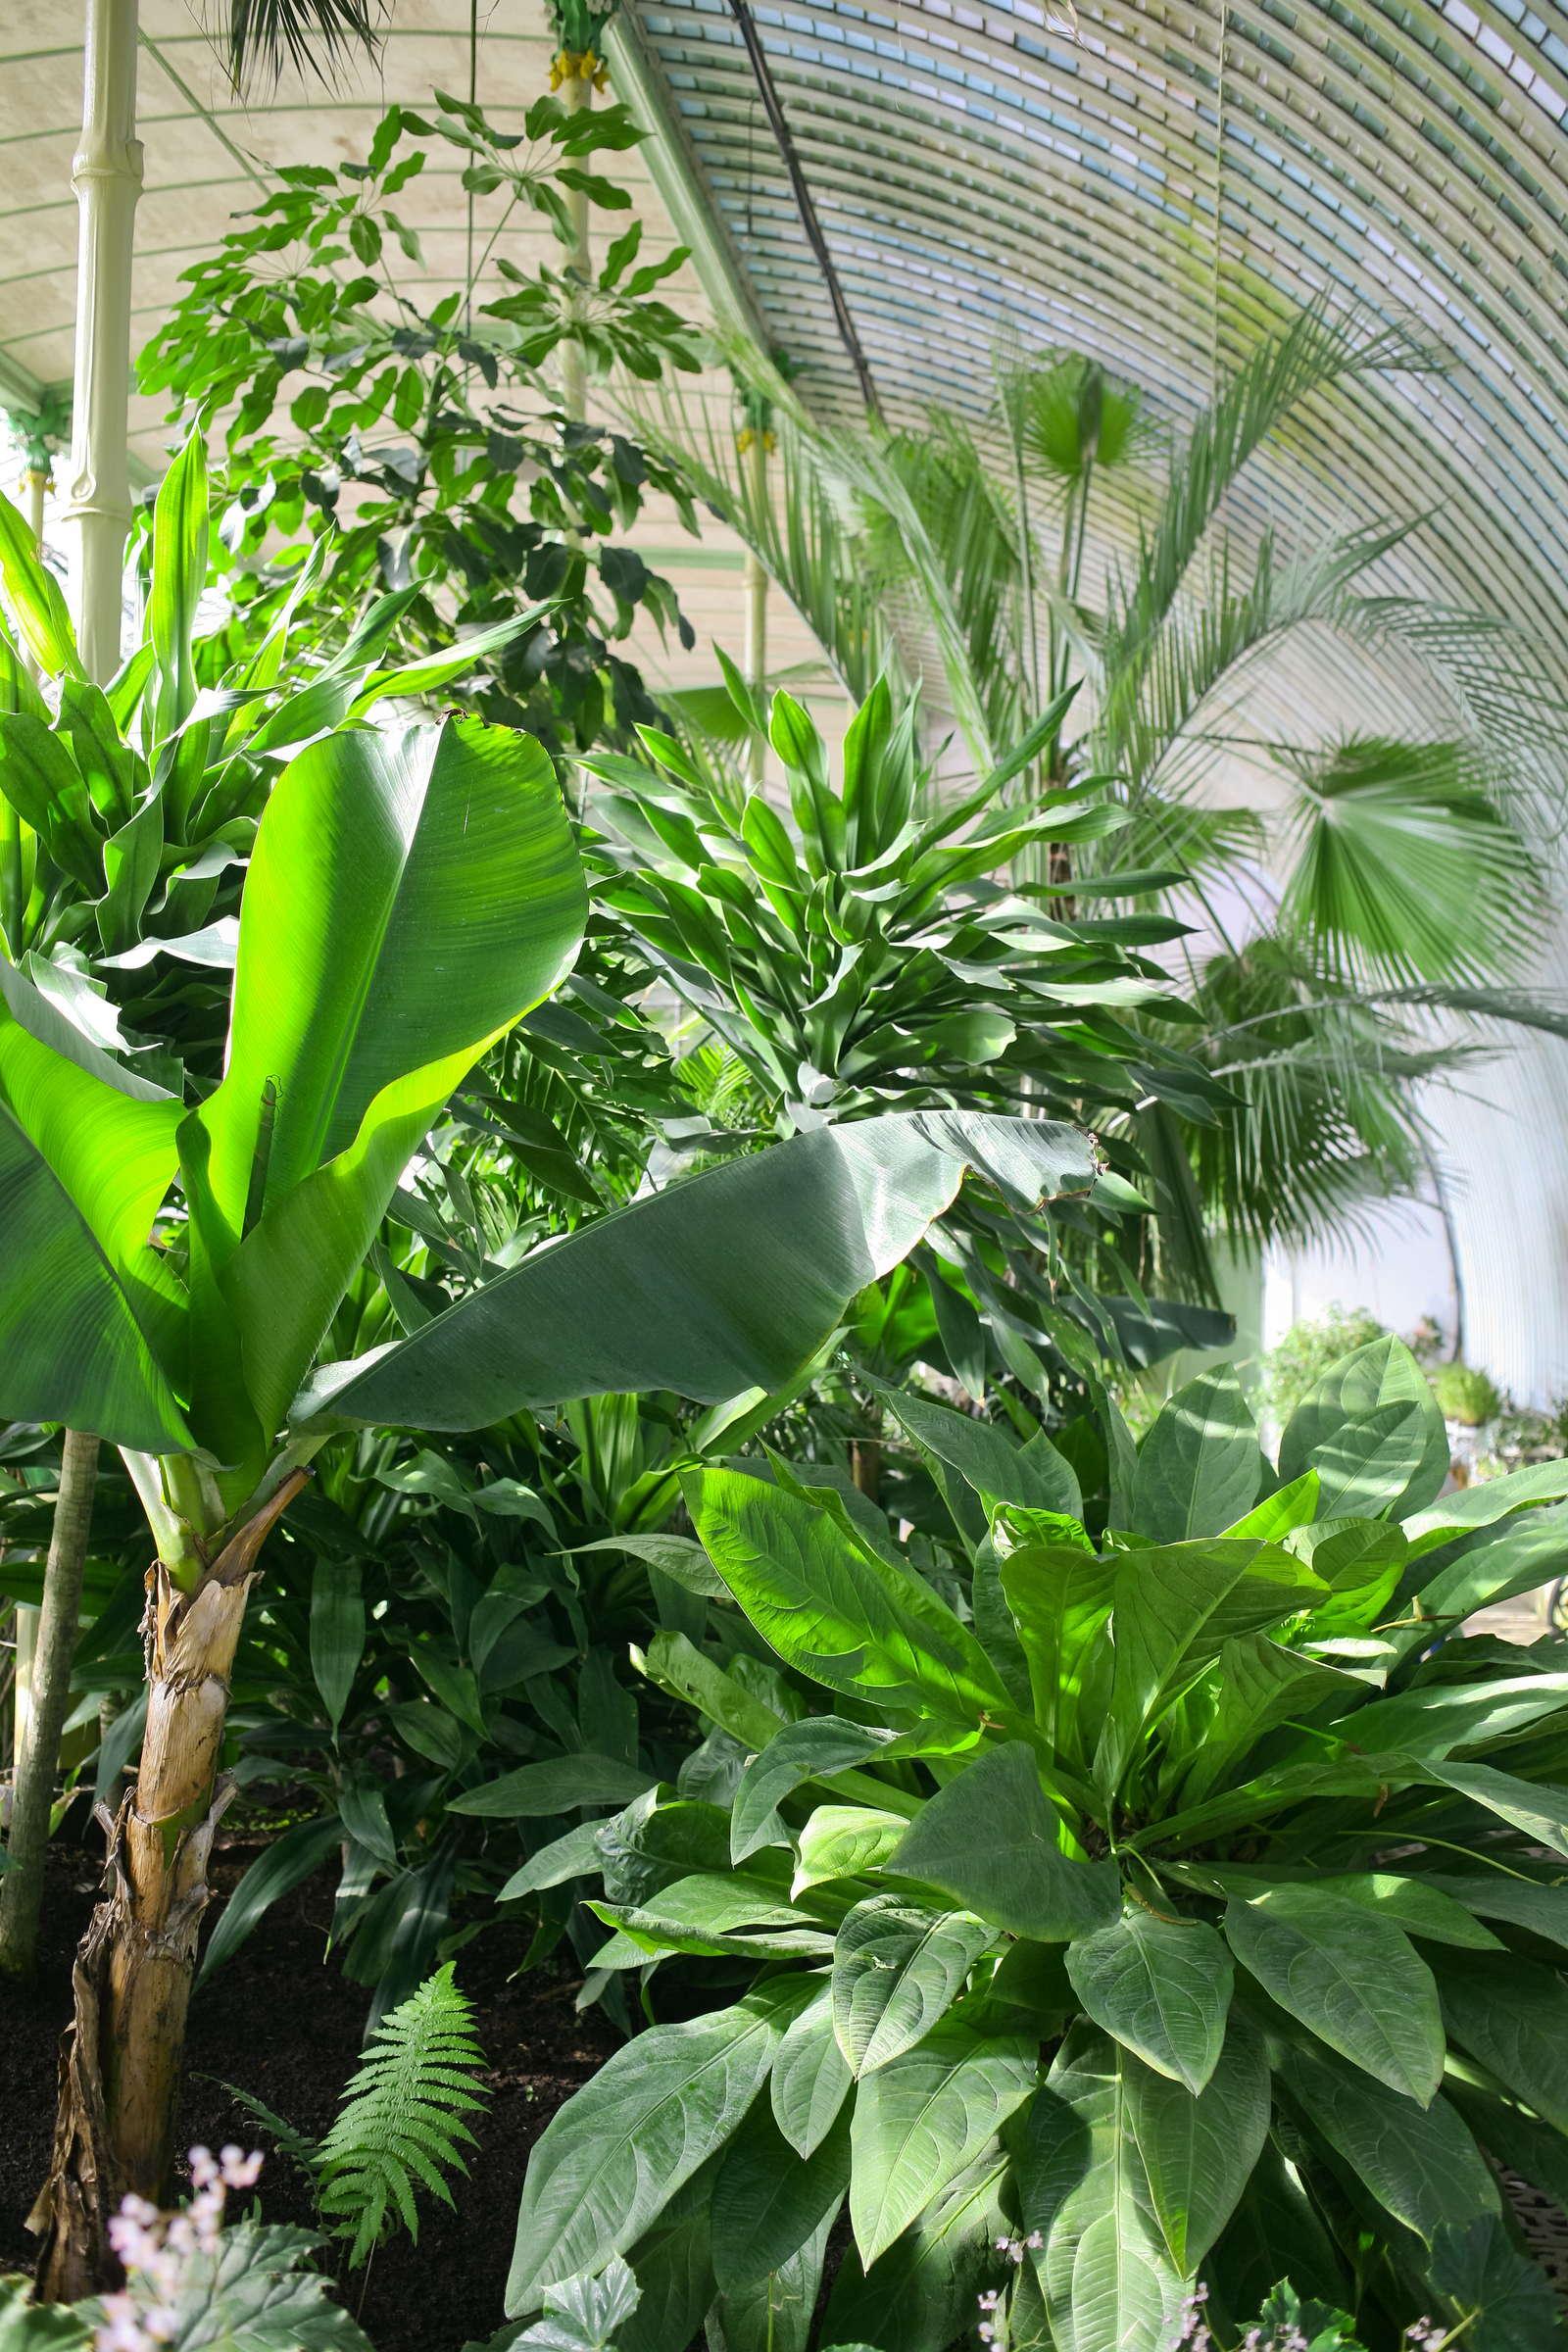 bananenpflanze erfolgreich berwintern plantura. Black Bedroom Furniture Sets. Home Design Ideas